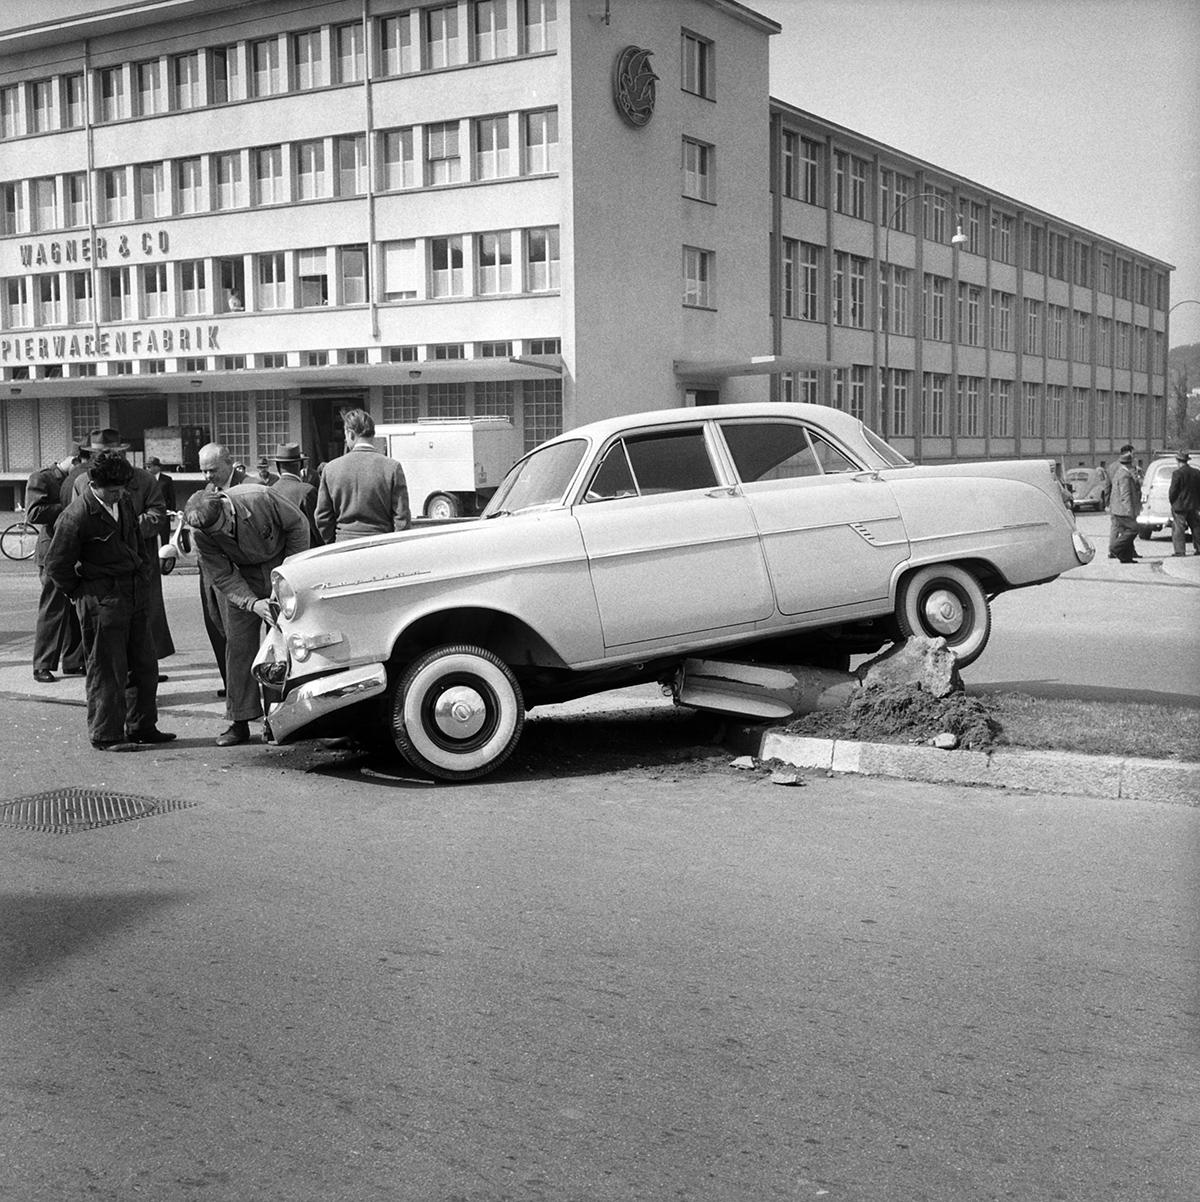 Arbeiter betrachten beschädigten Personenwagen, Schlieren 1959